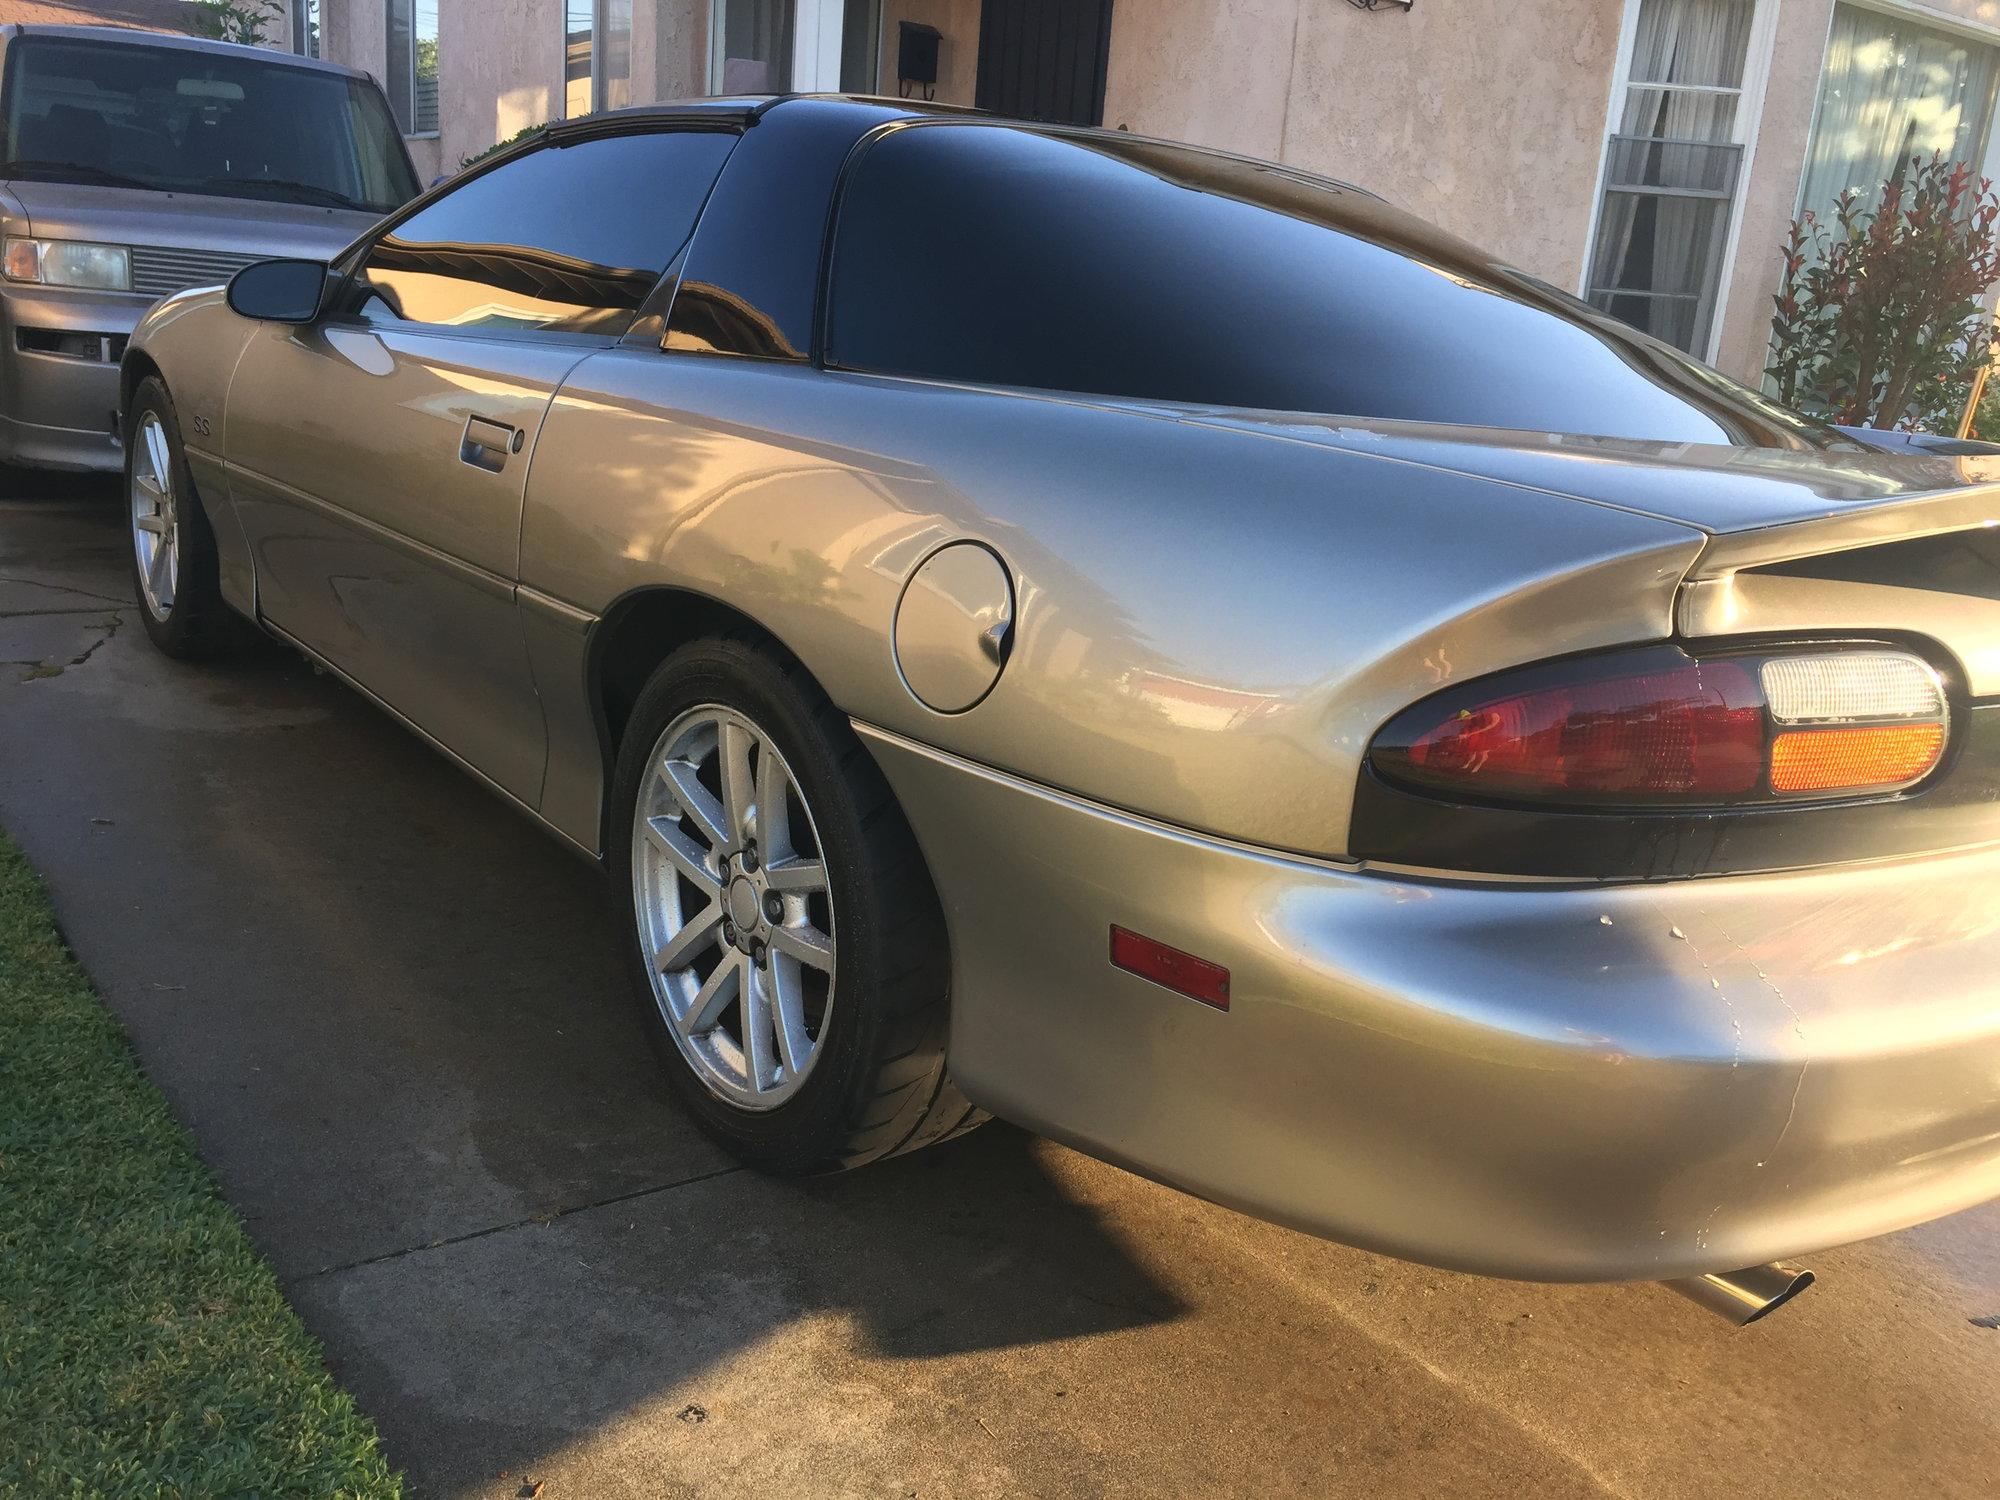 2001 SLP Camaro SS Ported Heads Cammed LS6 Pewter Metallic